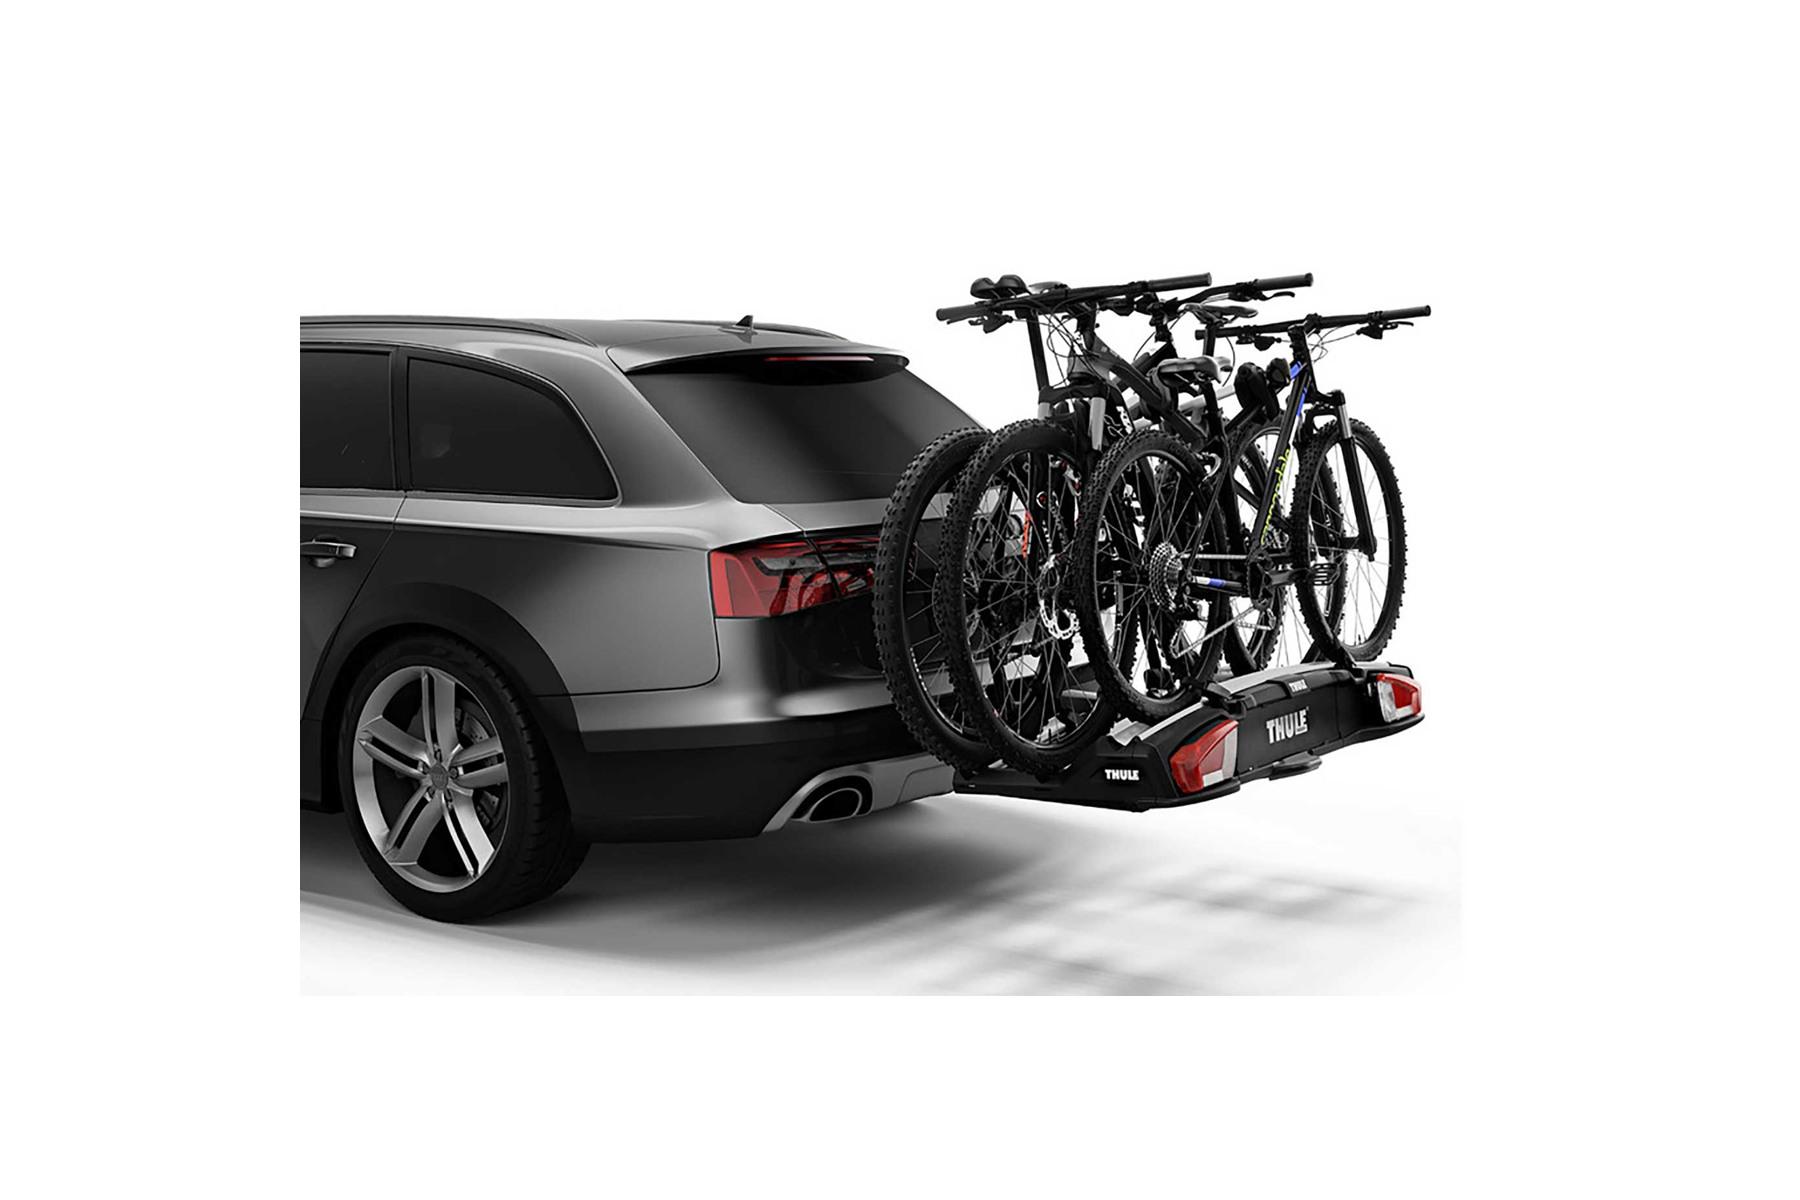 Achetez Thule VeloSpace XT 3 porte vélos